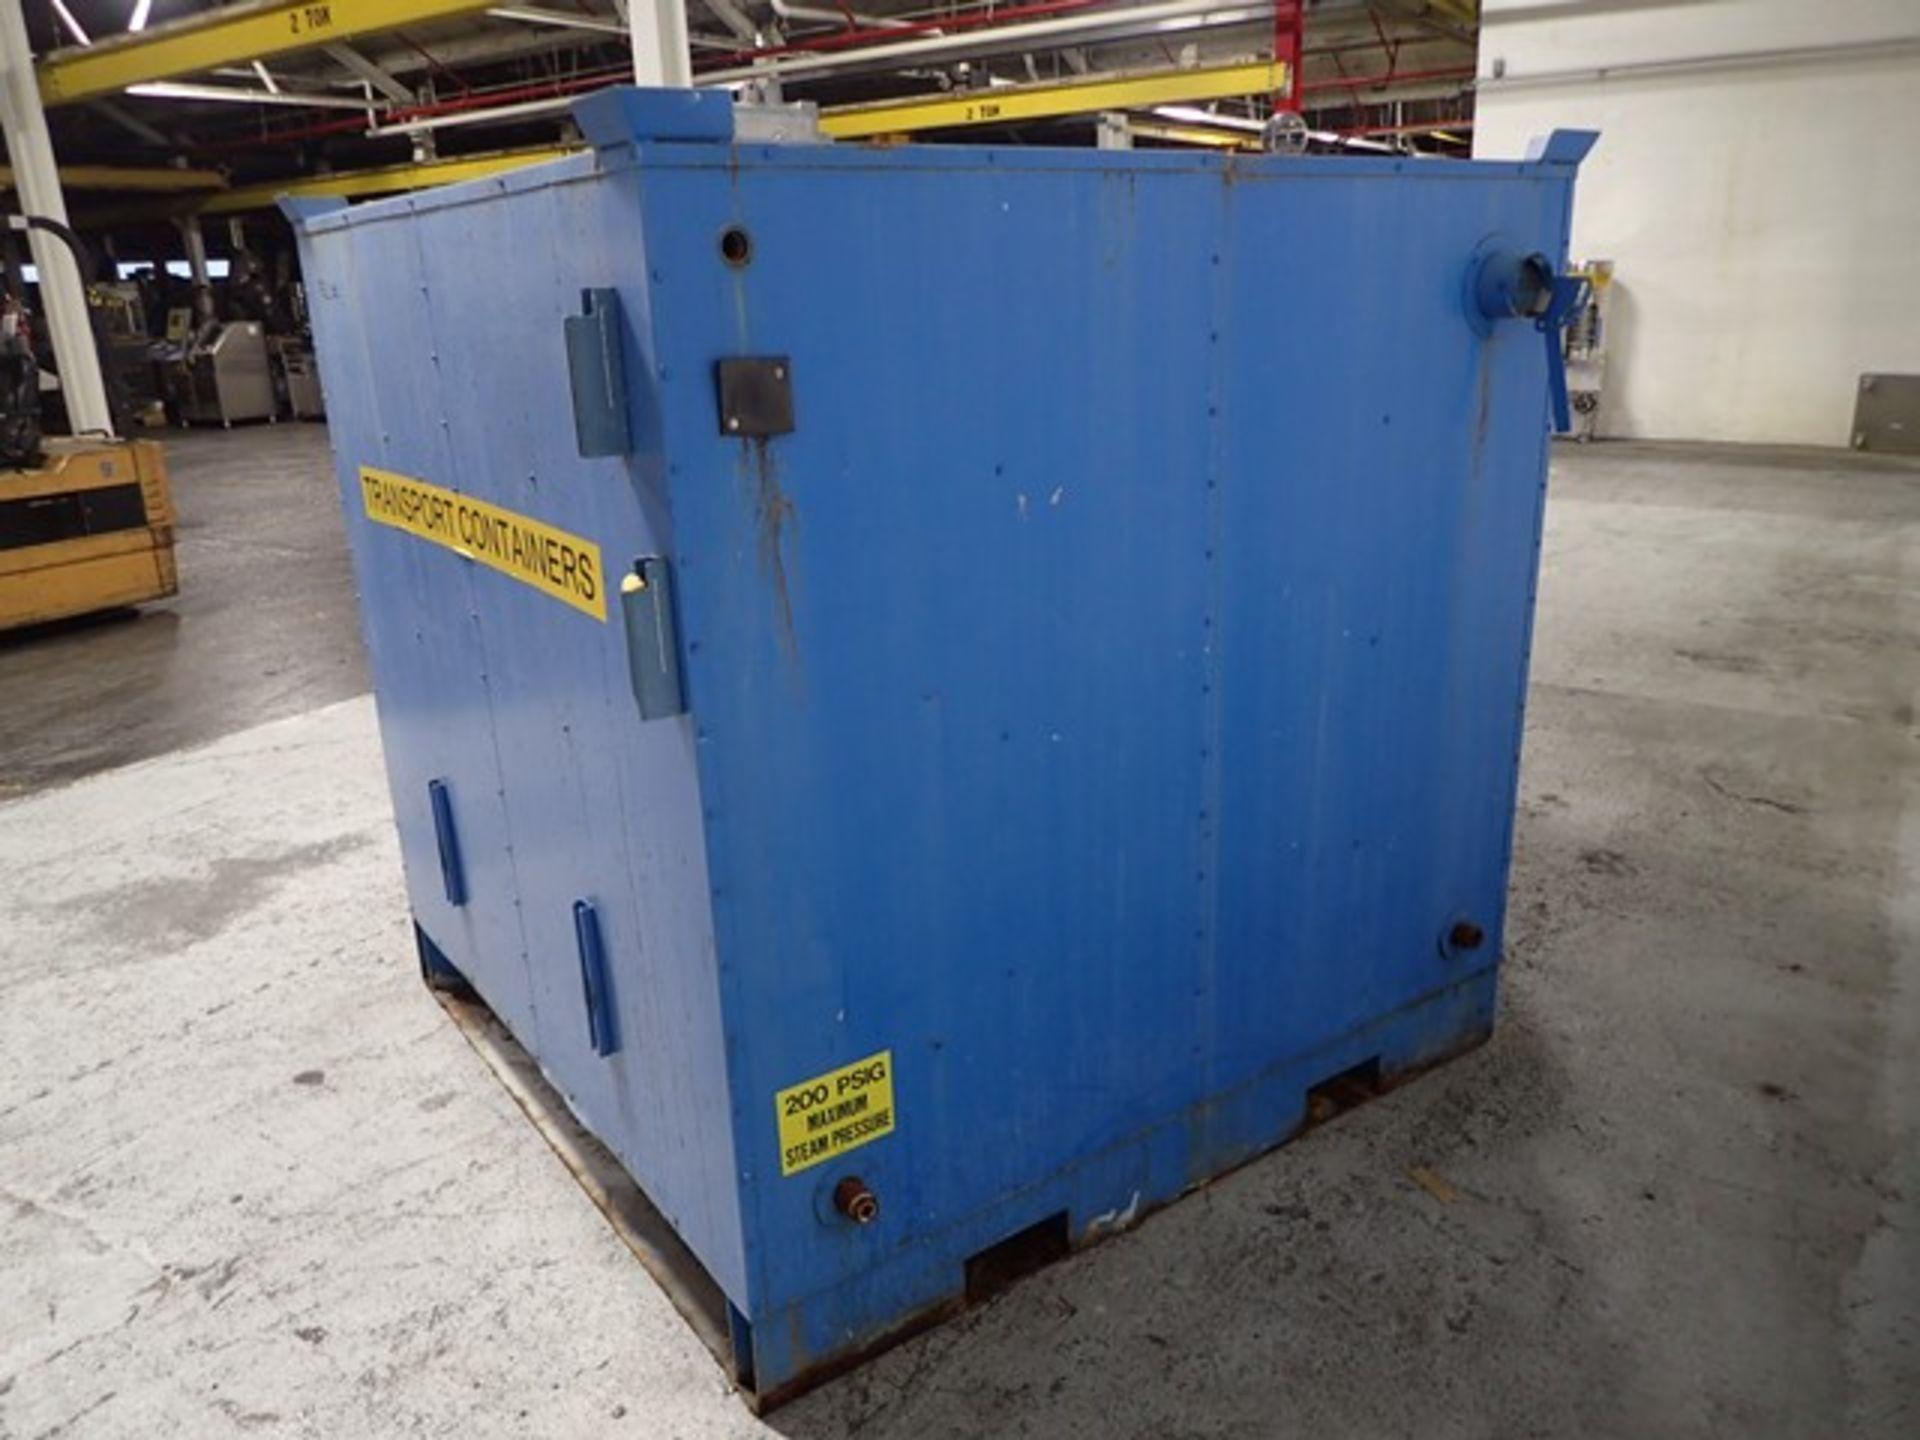 Lot 21 - LEWCO Heat-Pro Hot Box, Model HPSC-4